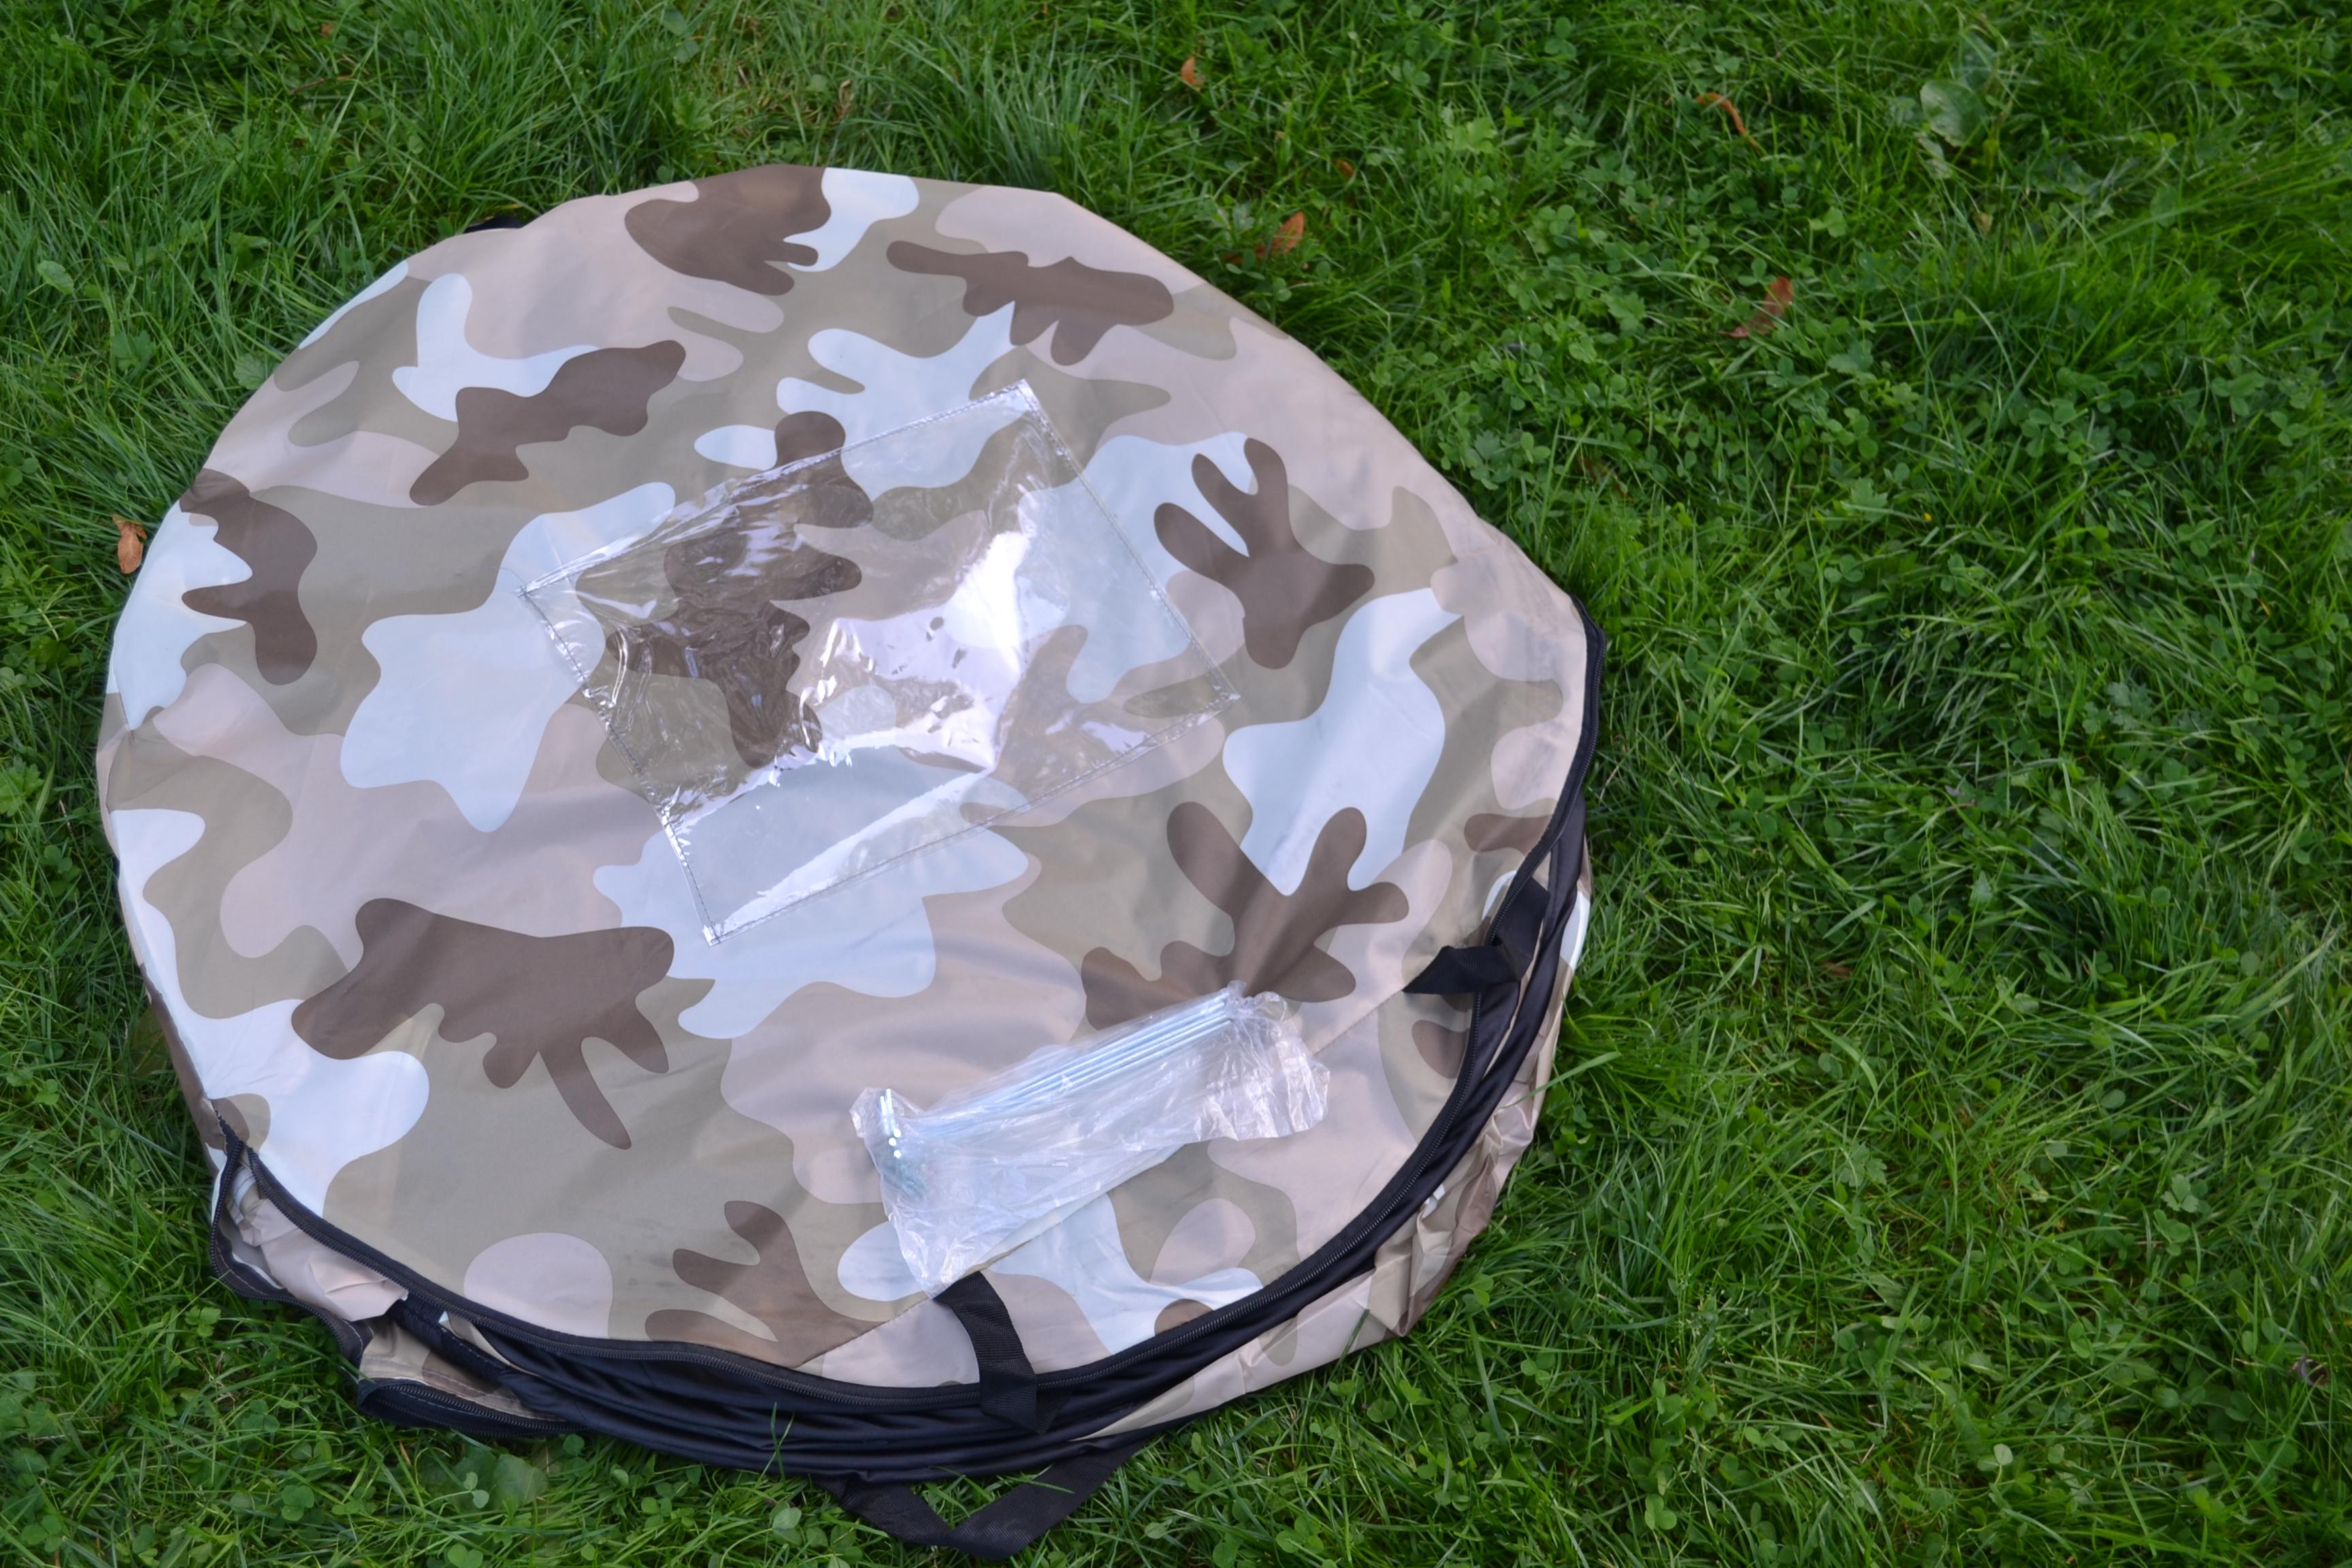 Wurfzelt Sekundenzelt 2-3 Person Outdoor Campingzelt Tent Pop Up 245x145x110cm Hell-Camouflage